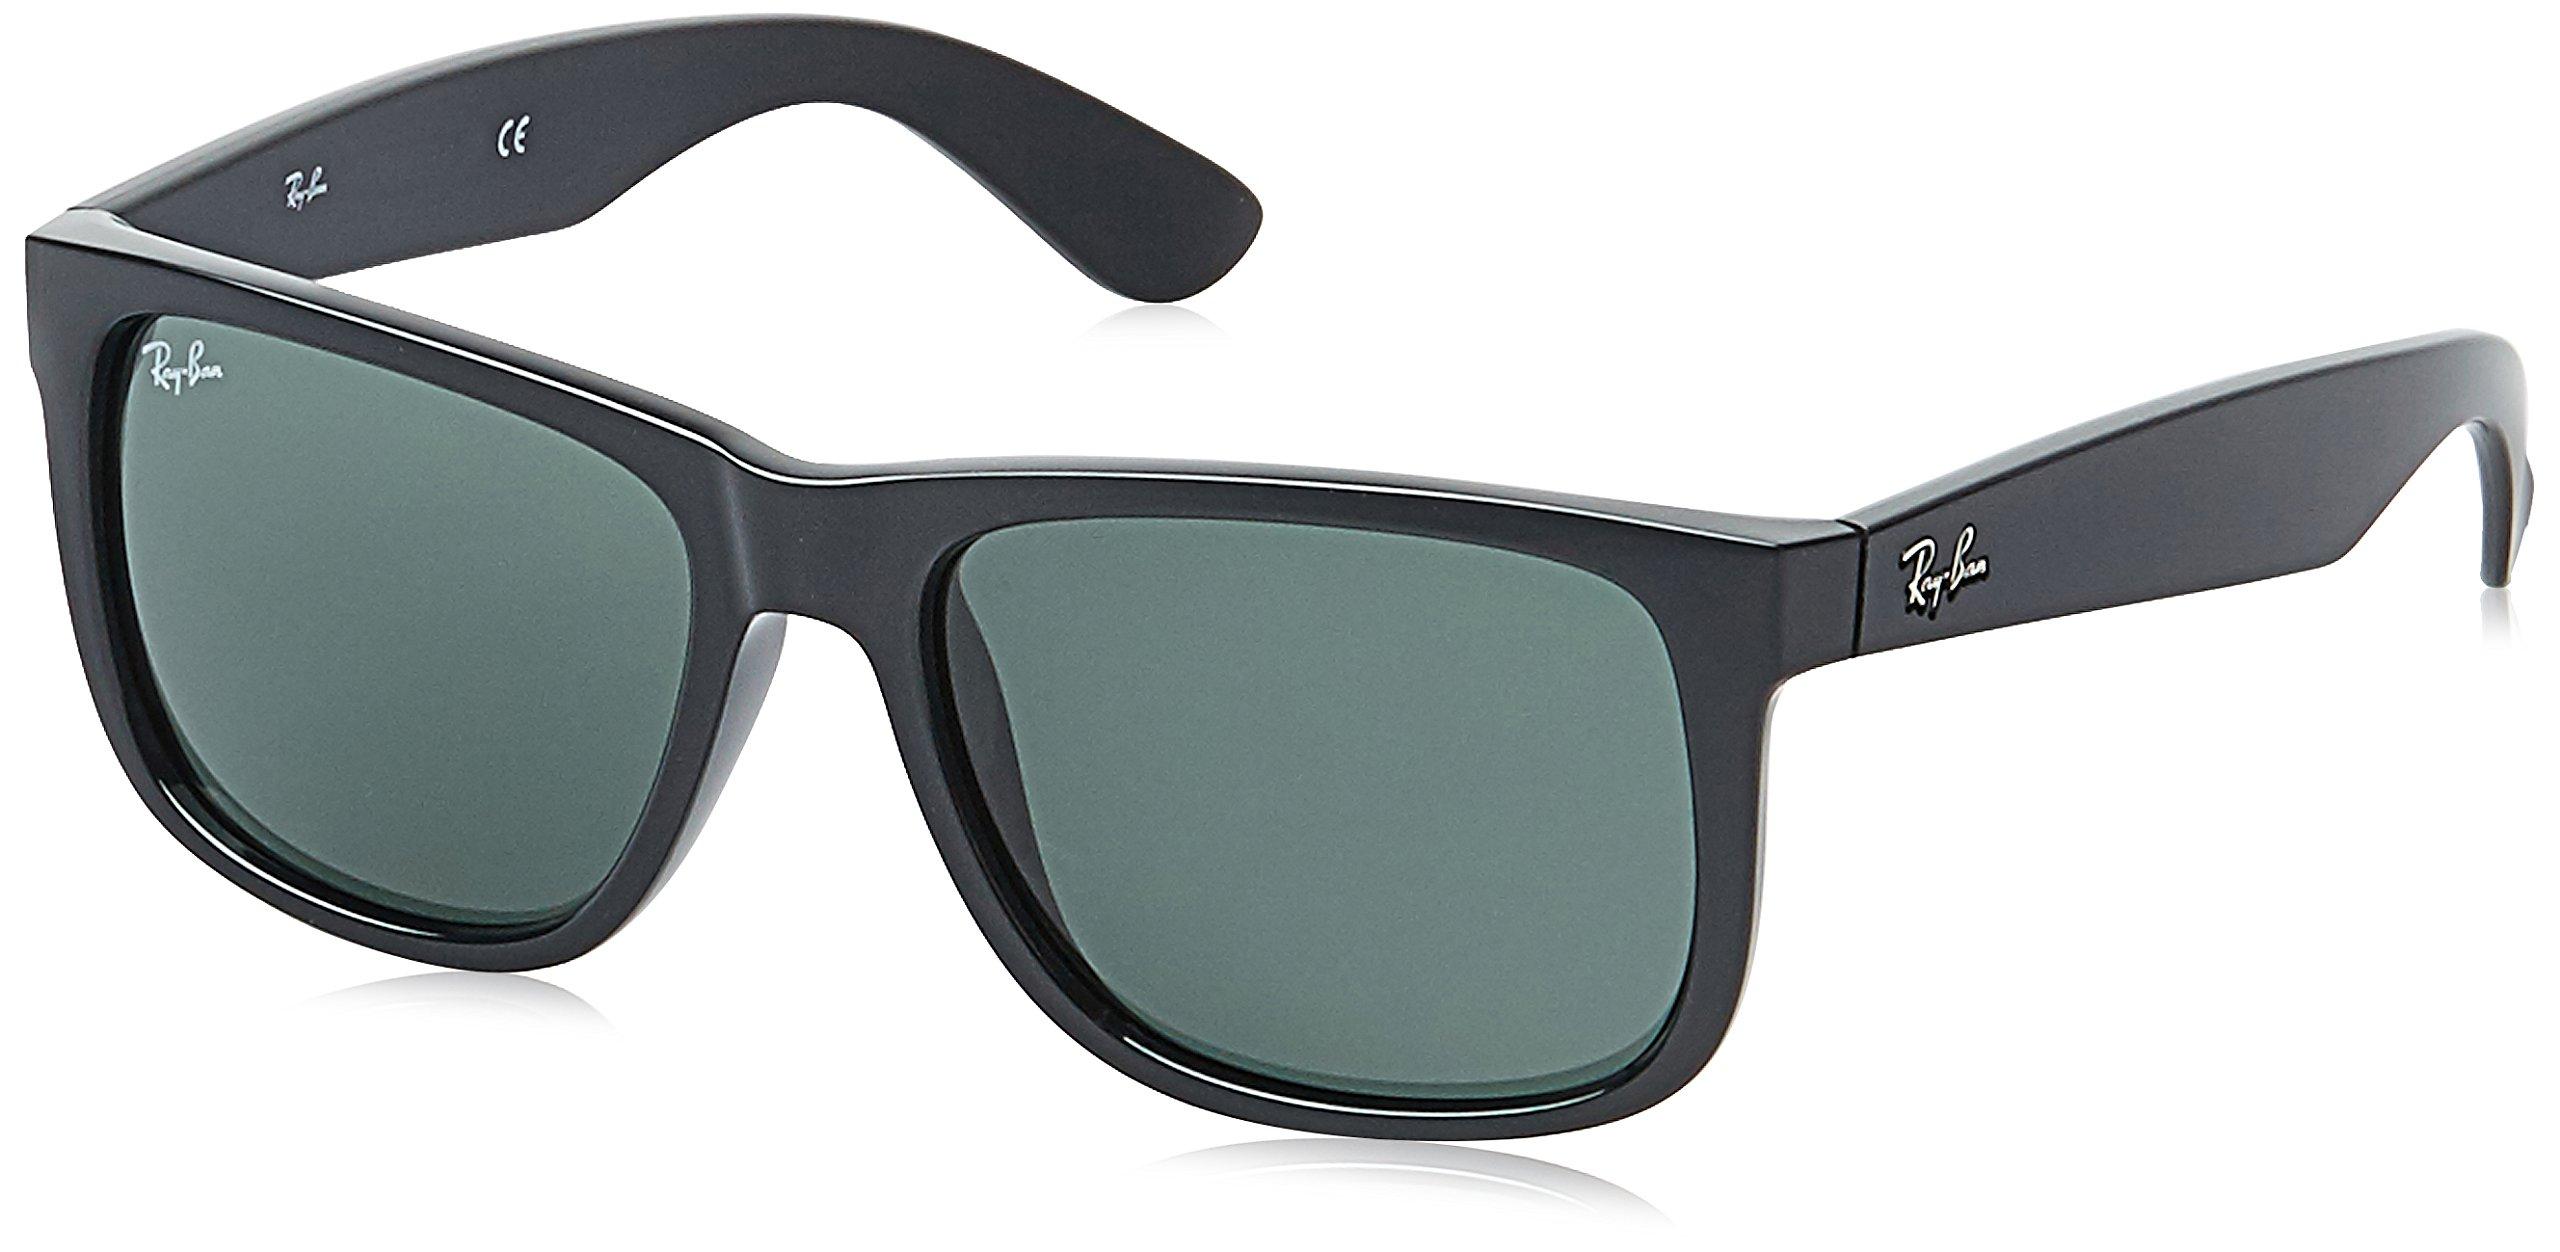 Ray-Ban Men's Justin Rectangular Sunglasses, Black, 55 mm